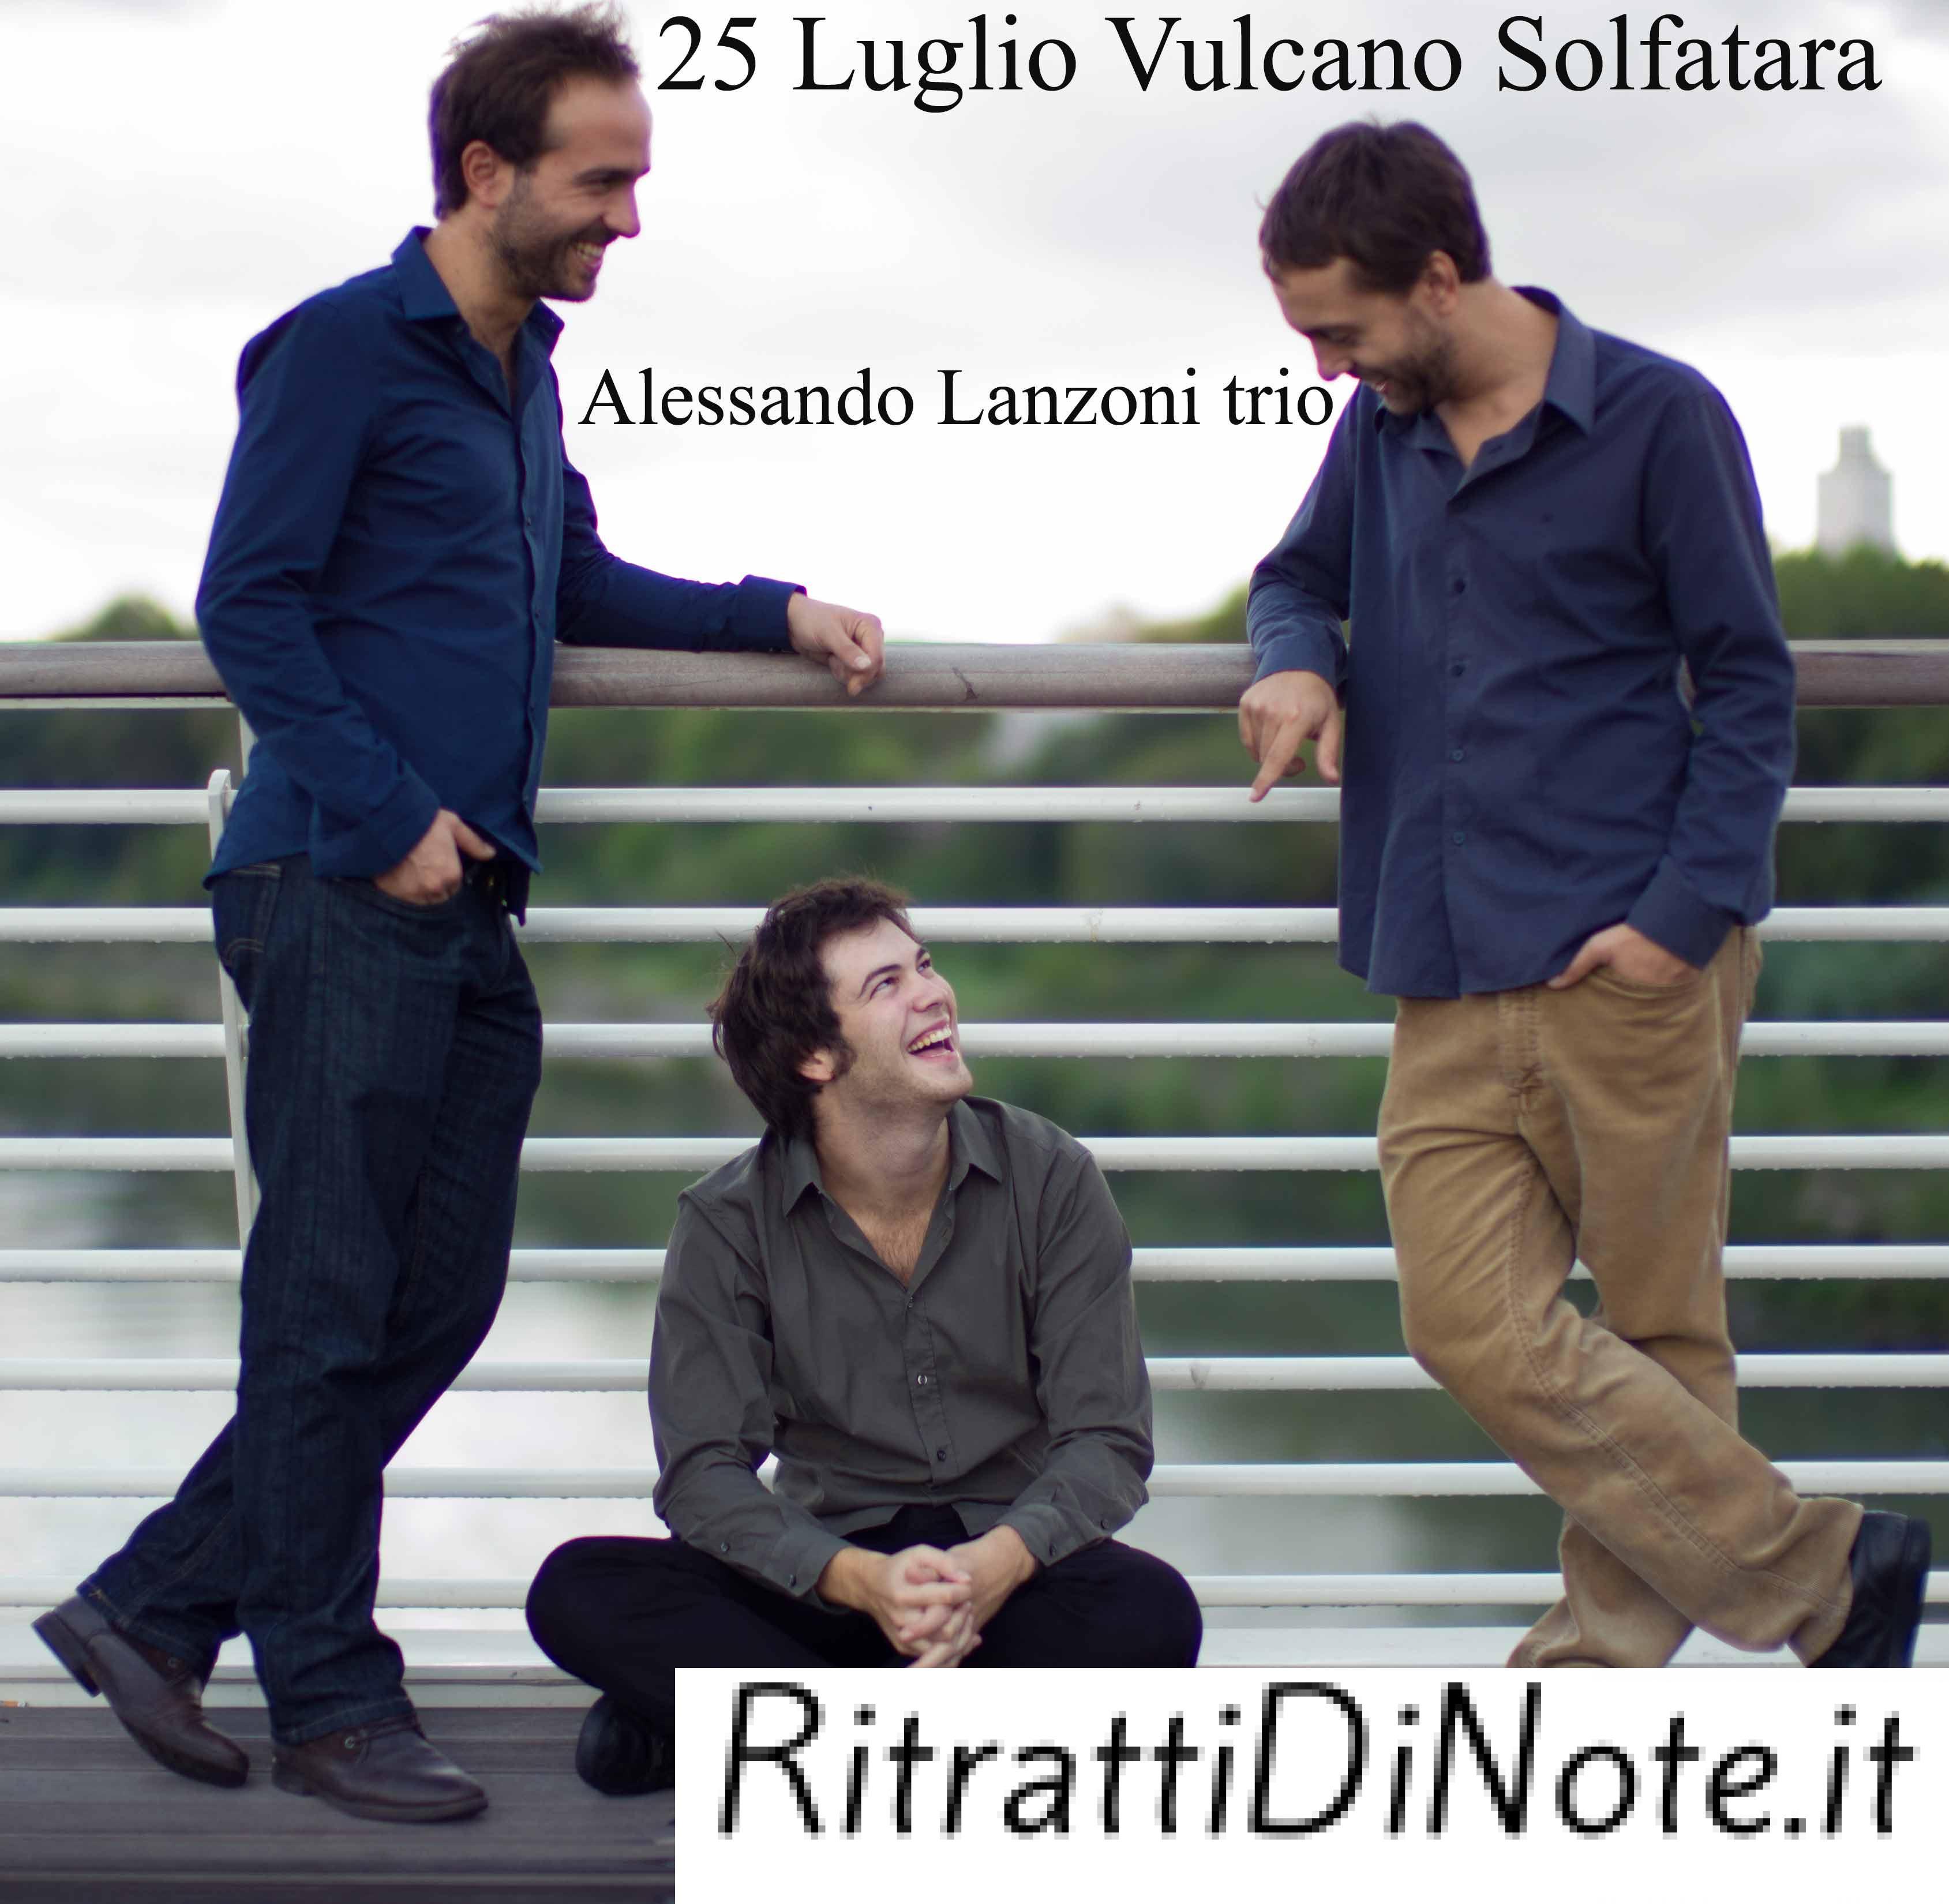 Pozzuoli Jazz Festival 2014 - Alessandro Lanzoni trio